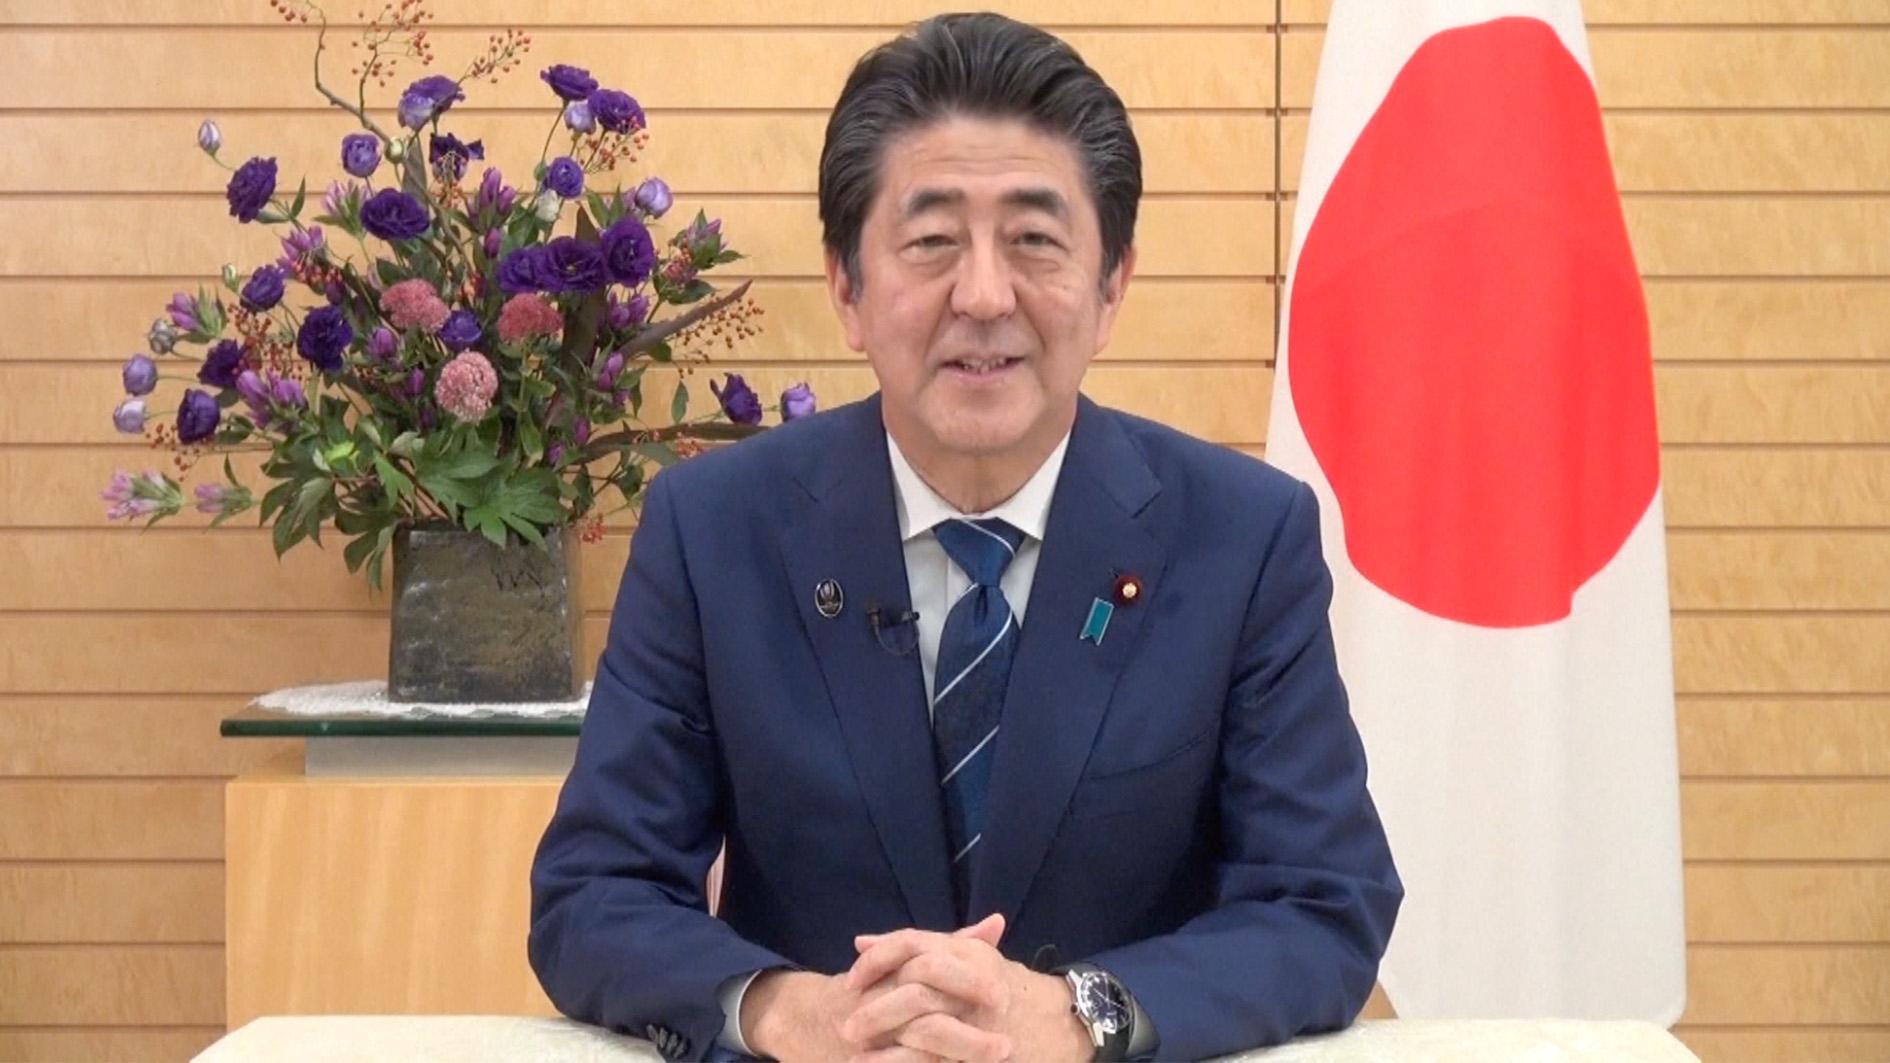 Abe vows to work towards new era in Japan-China ties